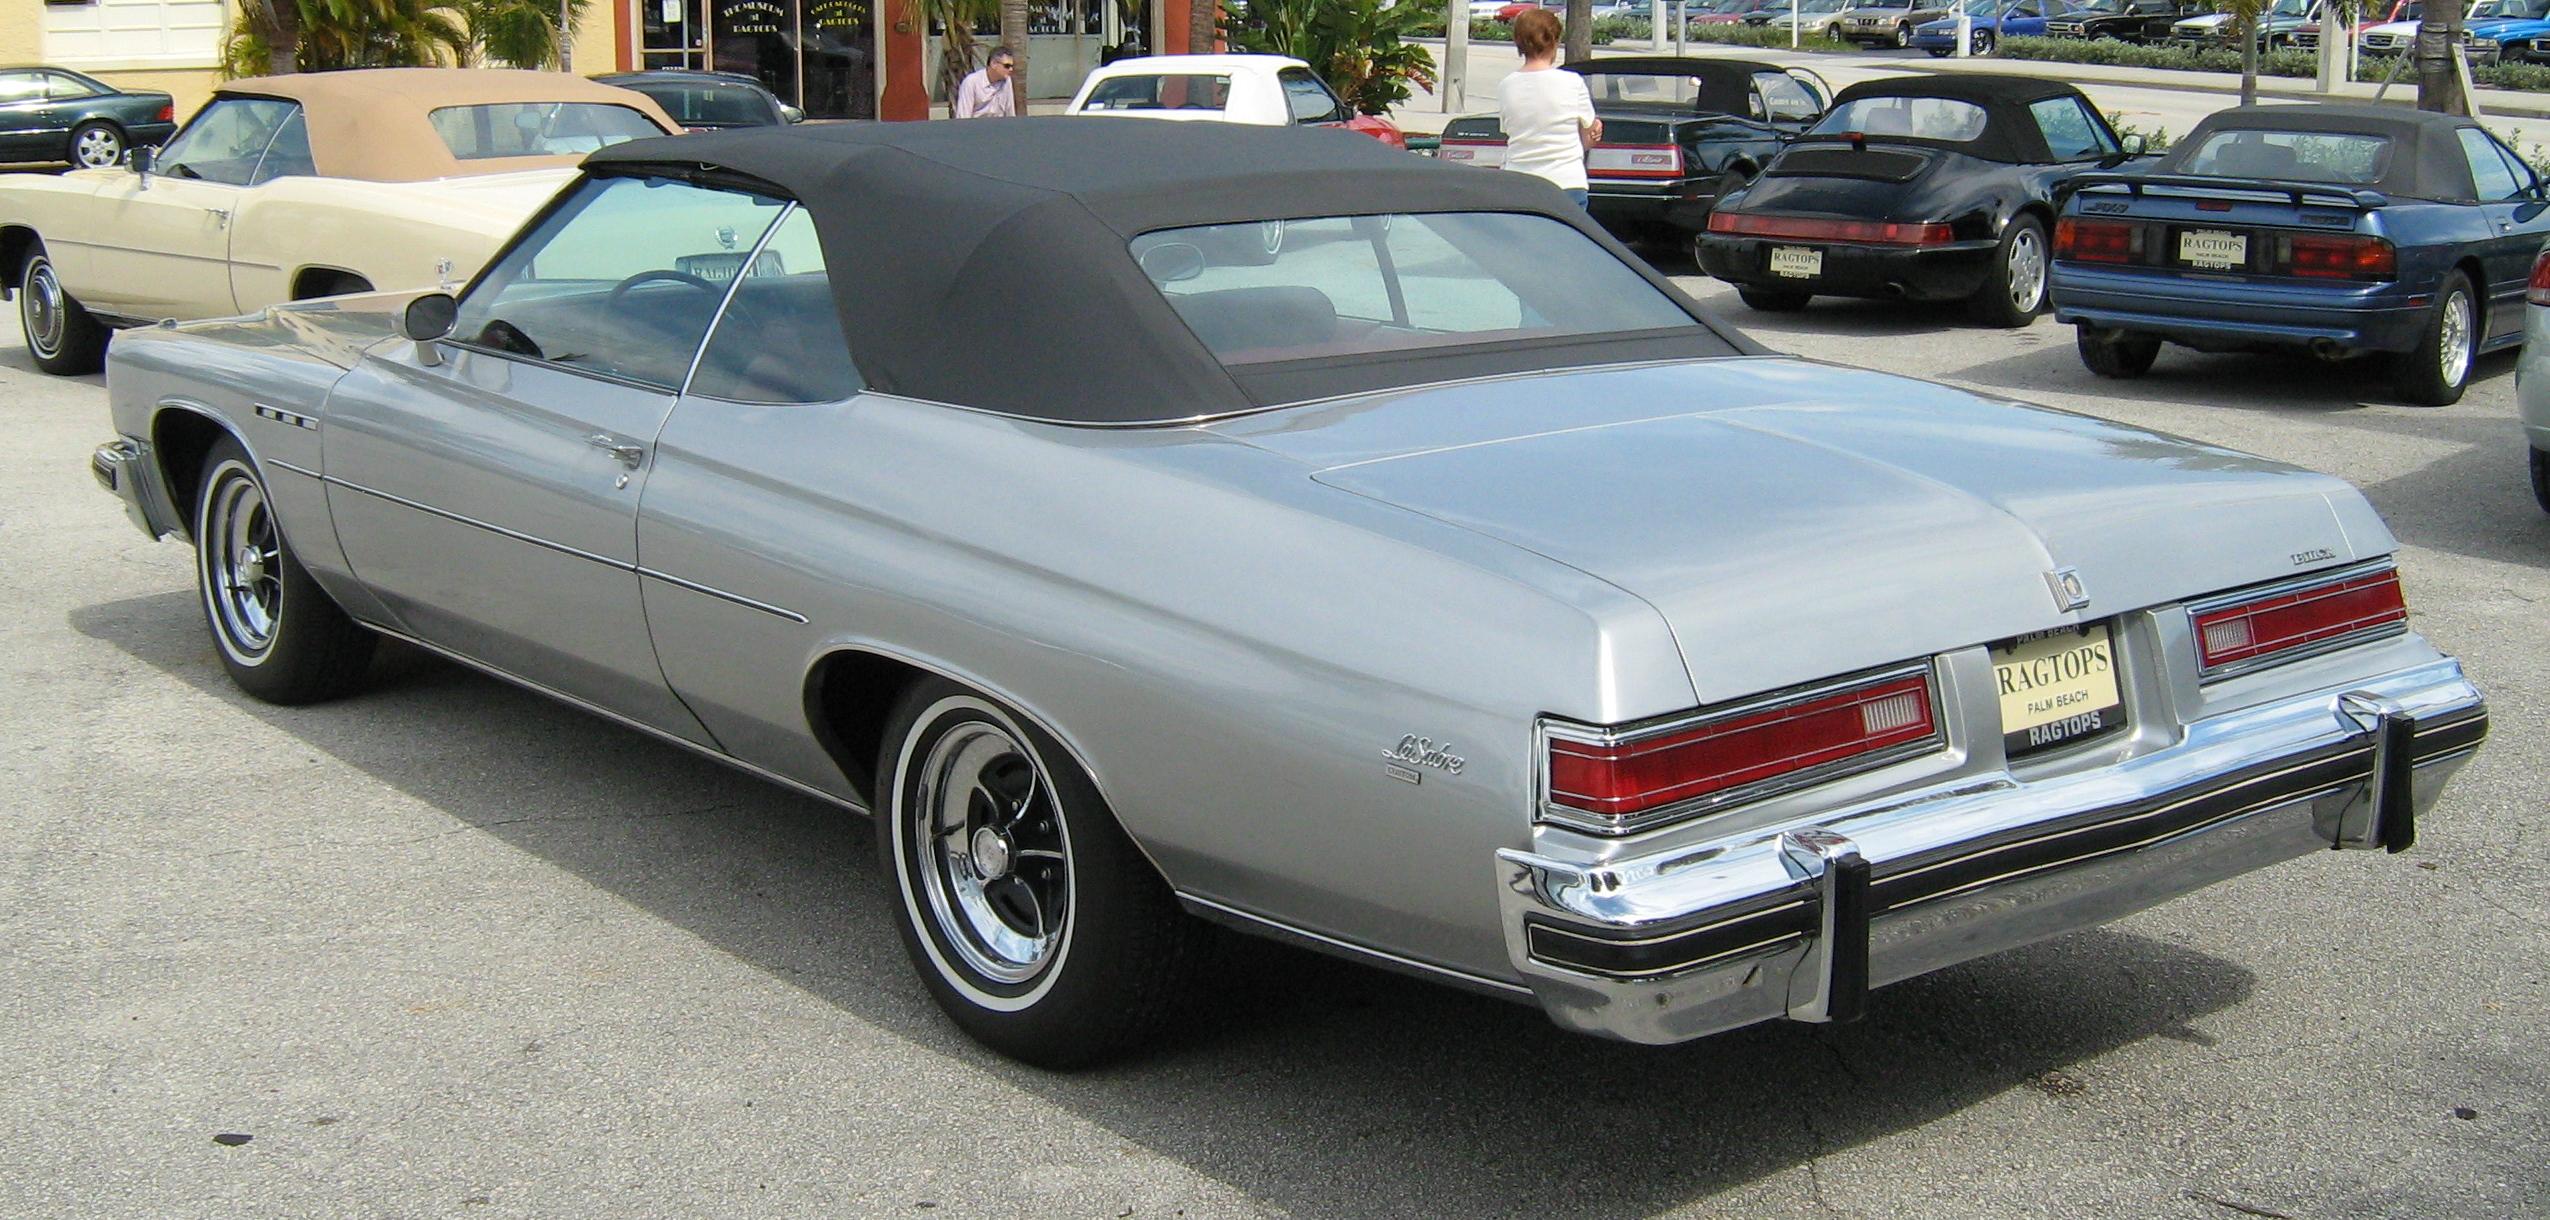 file:buick lesabre custom convertible silver-black fl-r